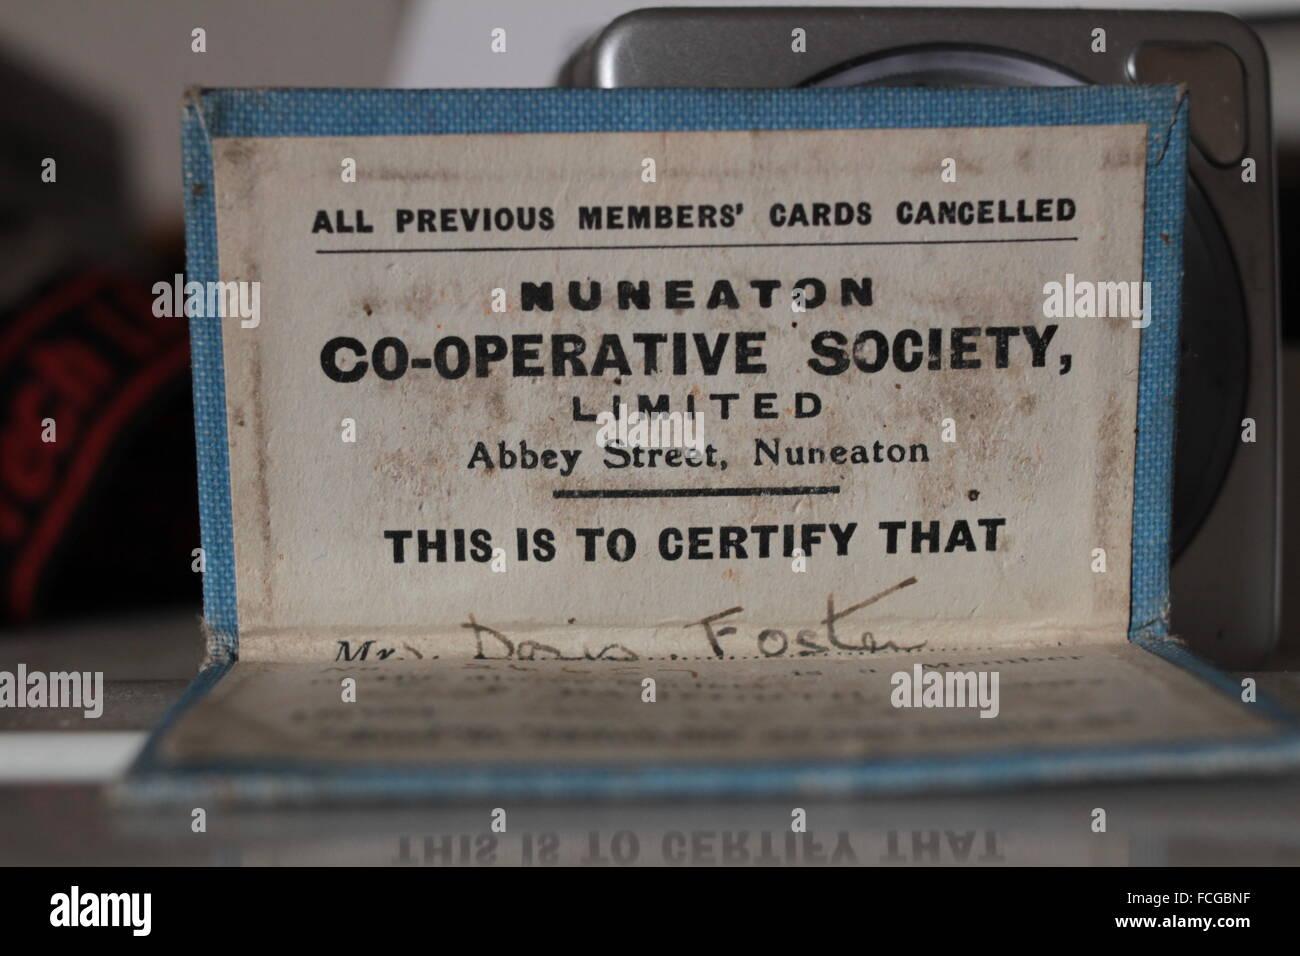 co-operative society members card - Stock Image